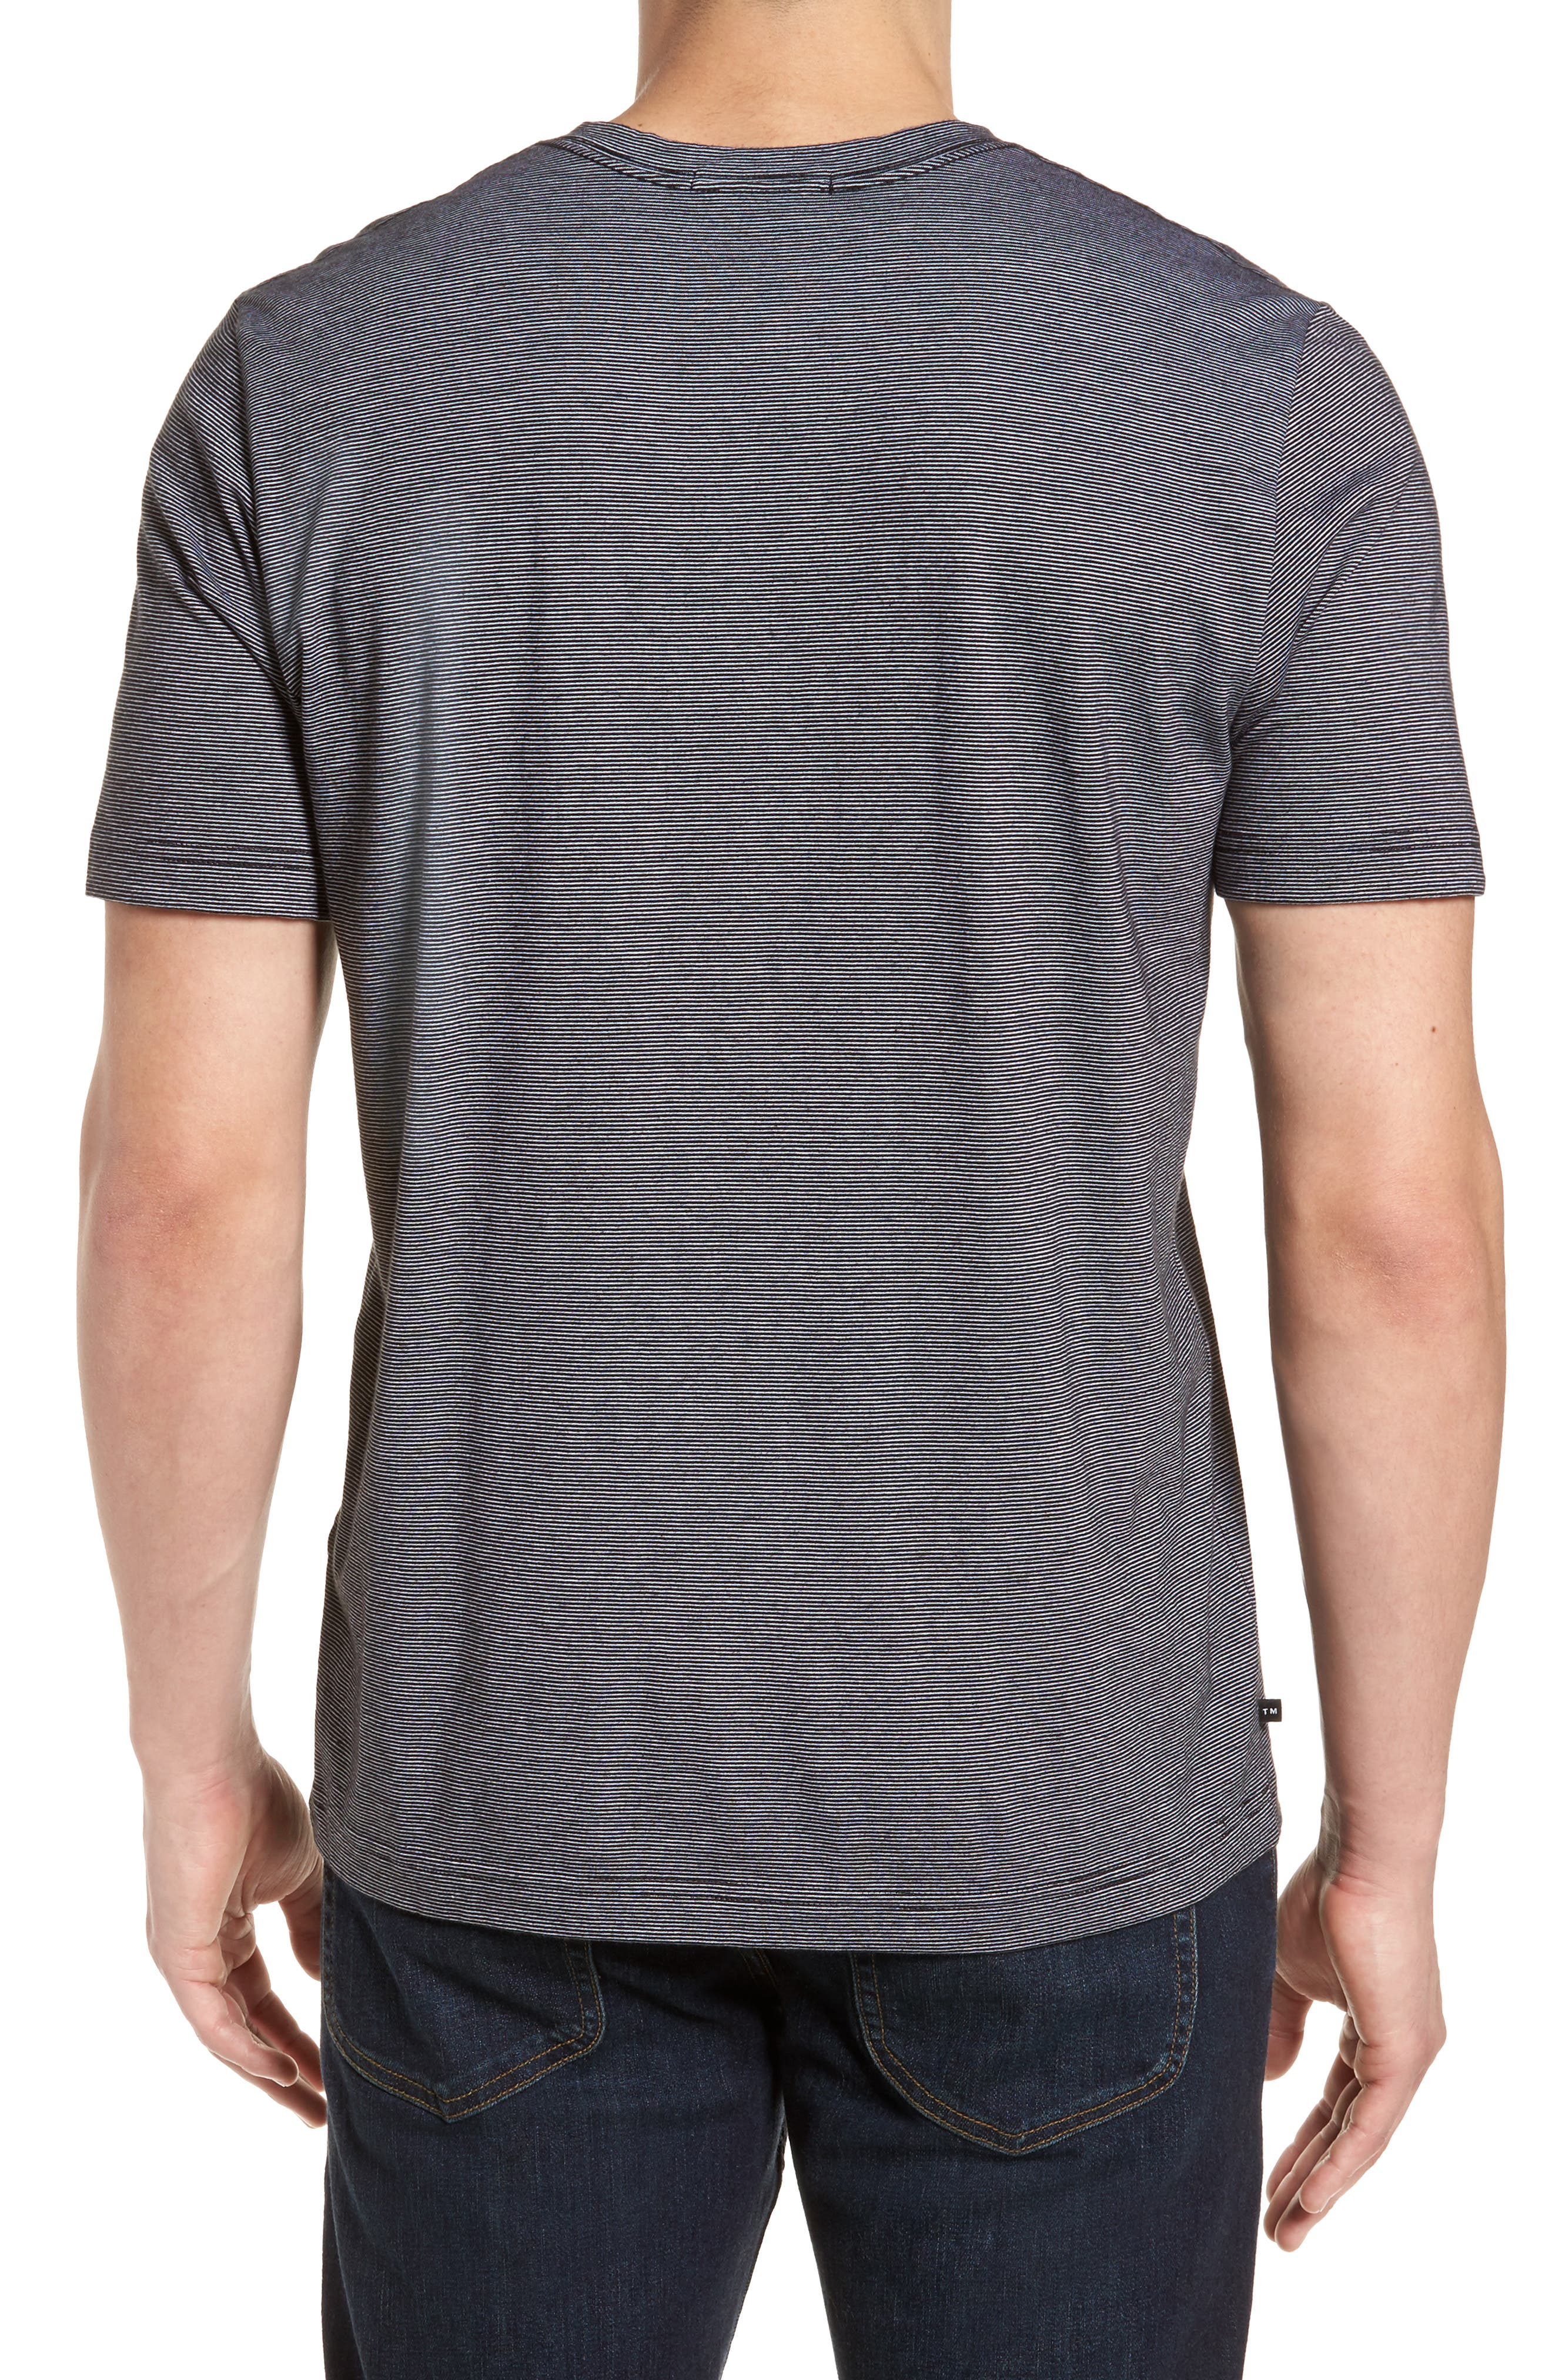 El Presidente T-Shirt,                             Alternate thumbnail 2, color,                             Black/ White